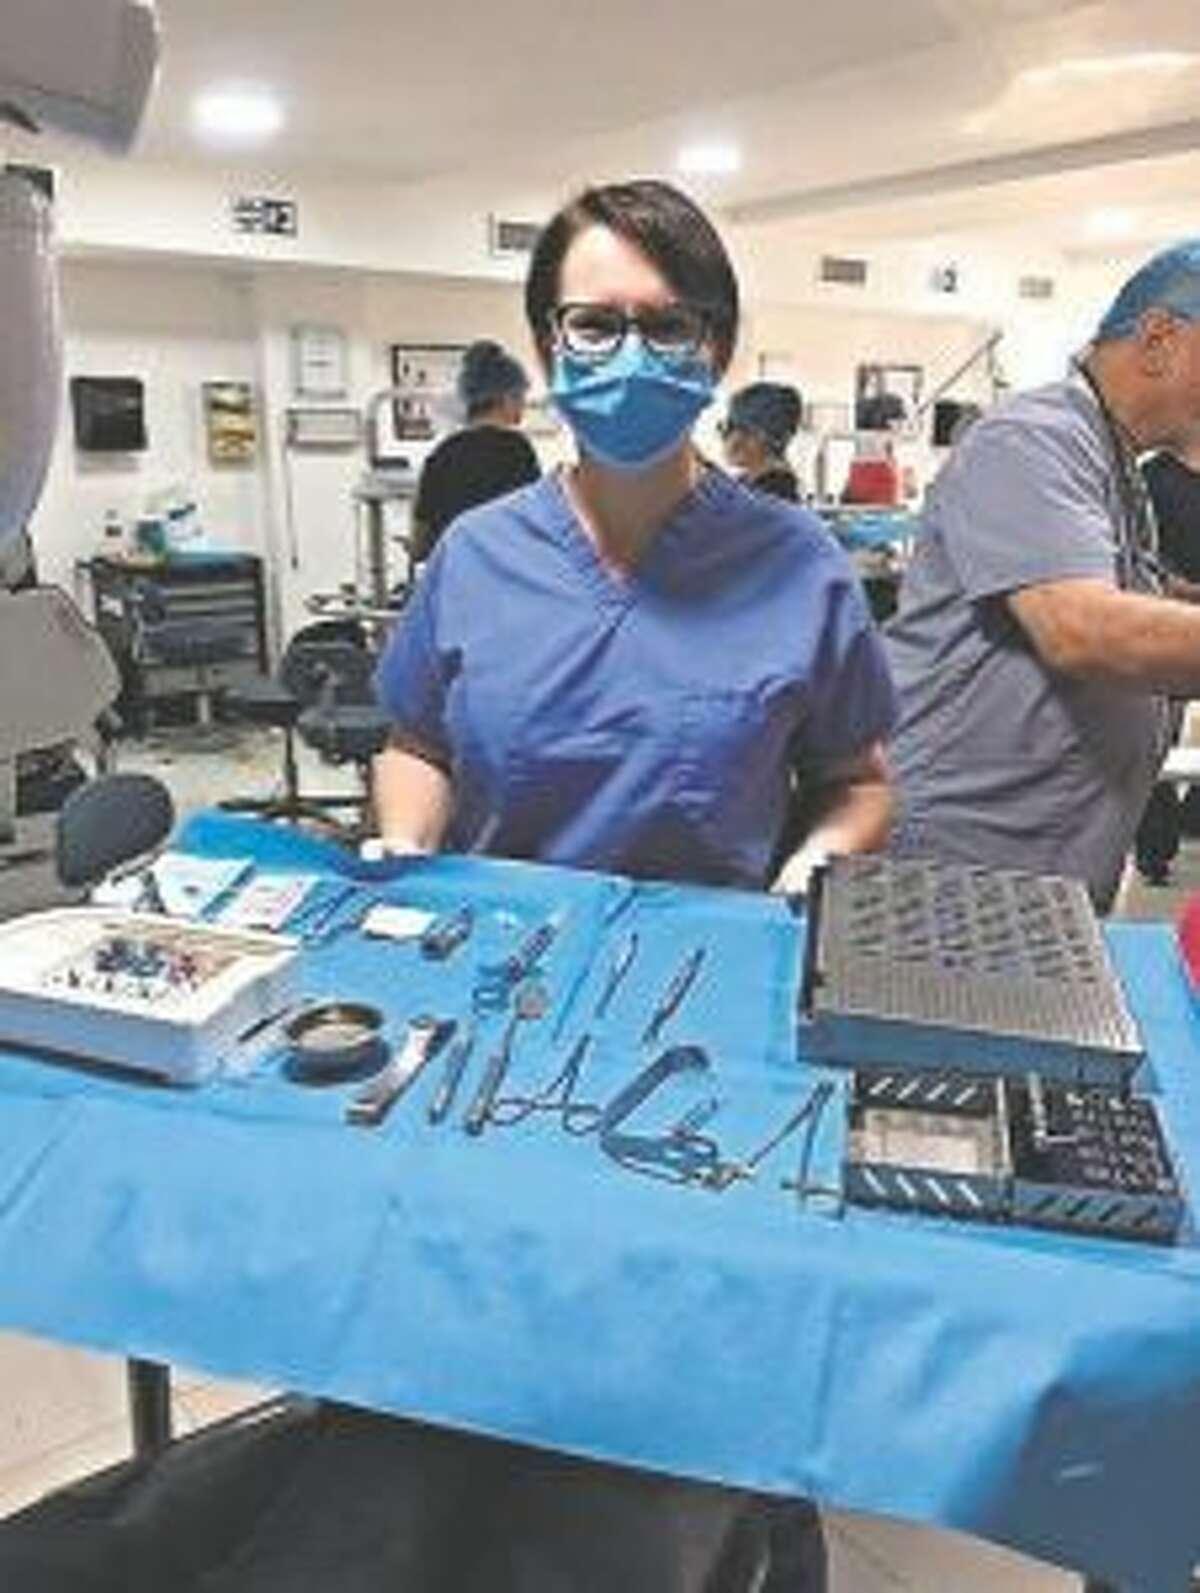 Julie Stefanski spent three days in the Dominican Republic city of Santo Domingo doing volunteer dental work. (Courtesy Photo)